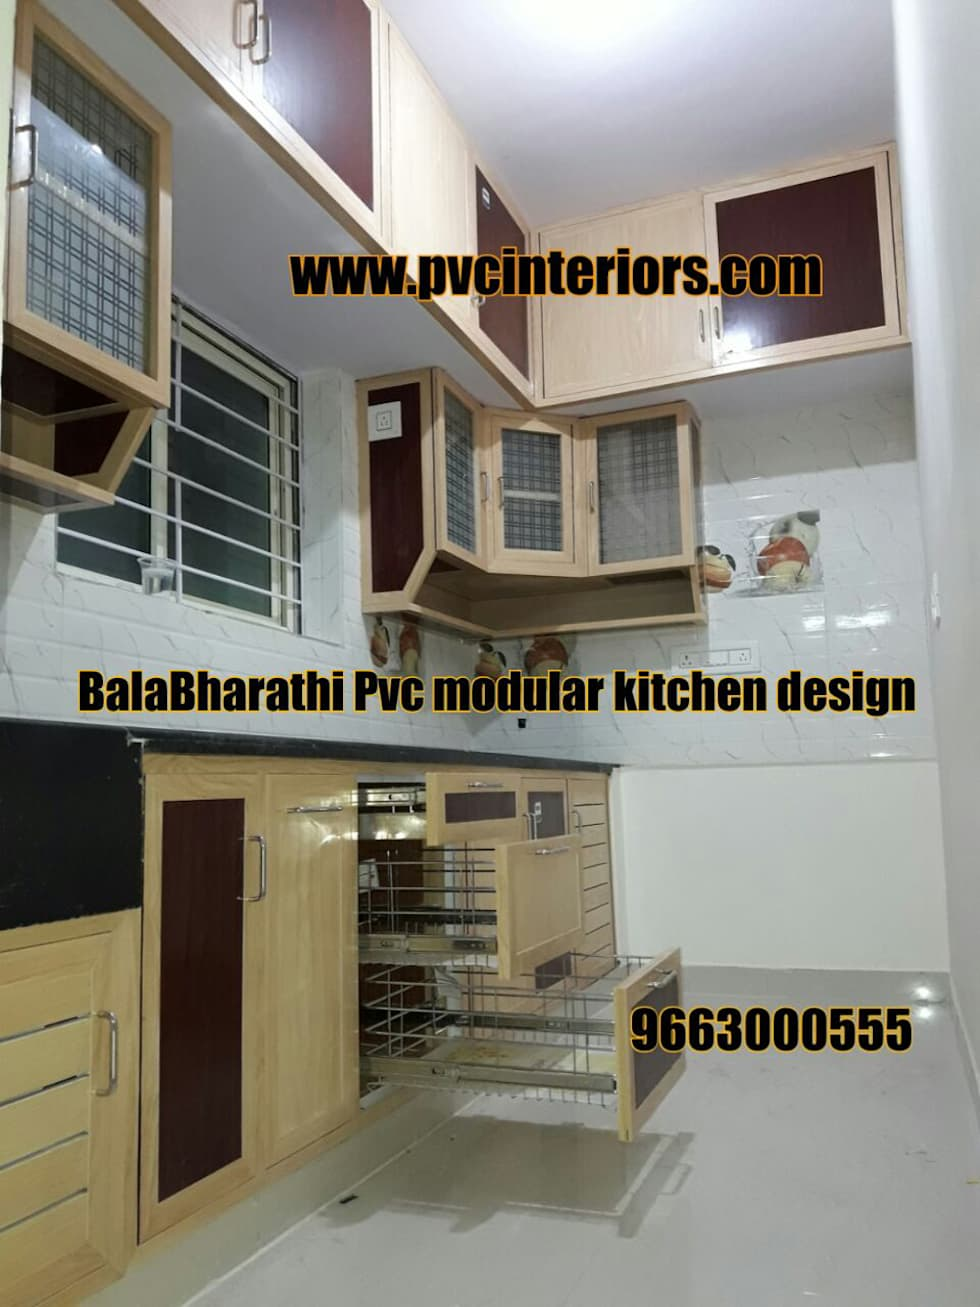 Best Pvc Cupboard Design In Bangalore Best Pvc Cupboard In Salem : Modern  Kitchen By Balabharathi